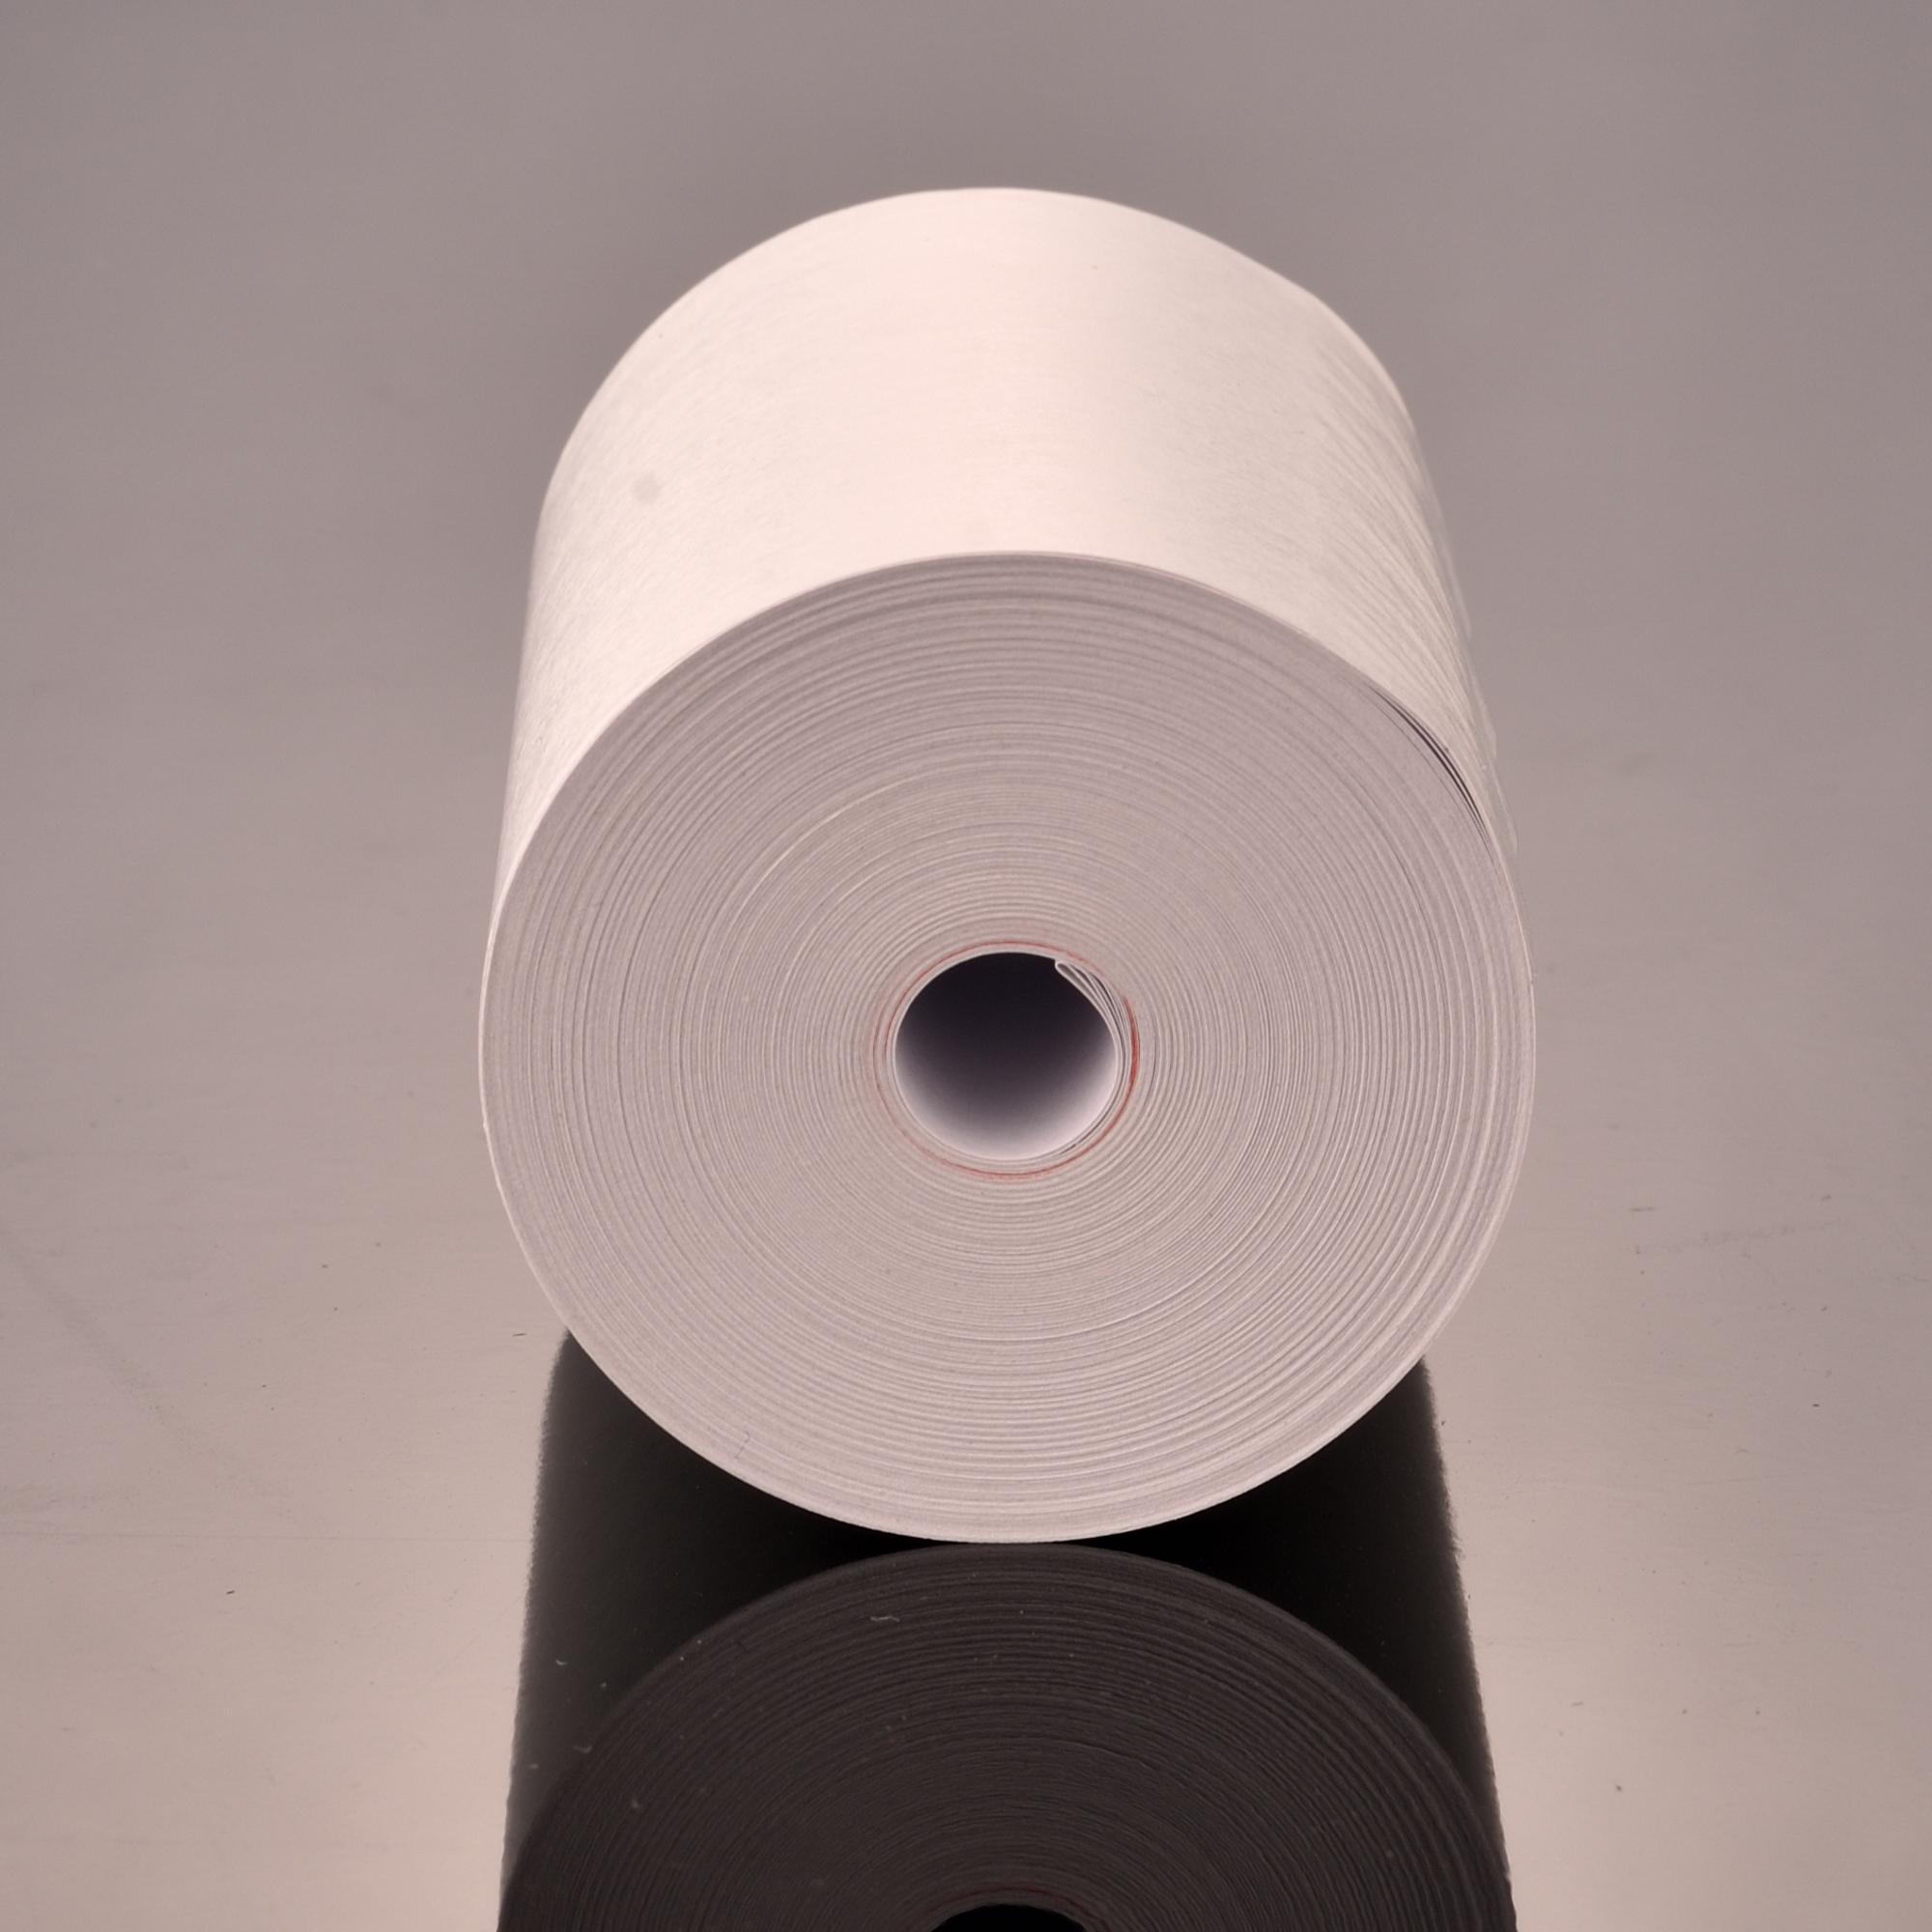 57x40 Thermal Receipt Paper roll 57mm x 40mm 70gsm High Quality Credit Card Machine / Grabfood / Foodpanda